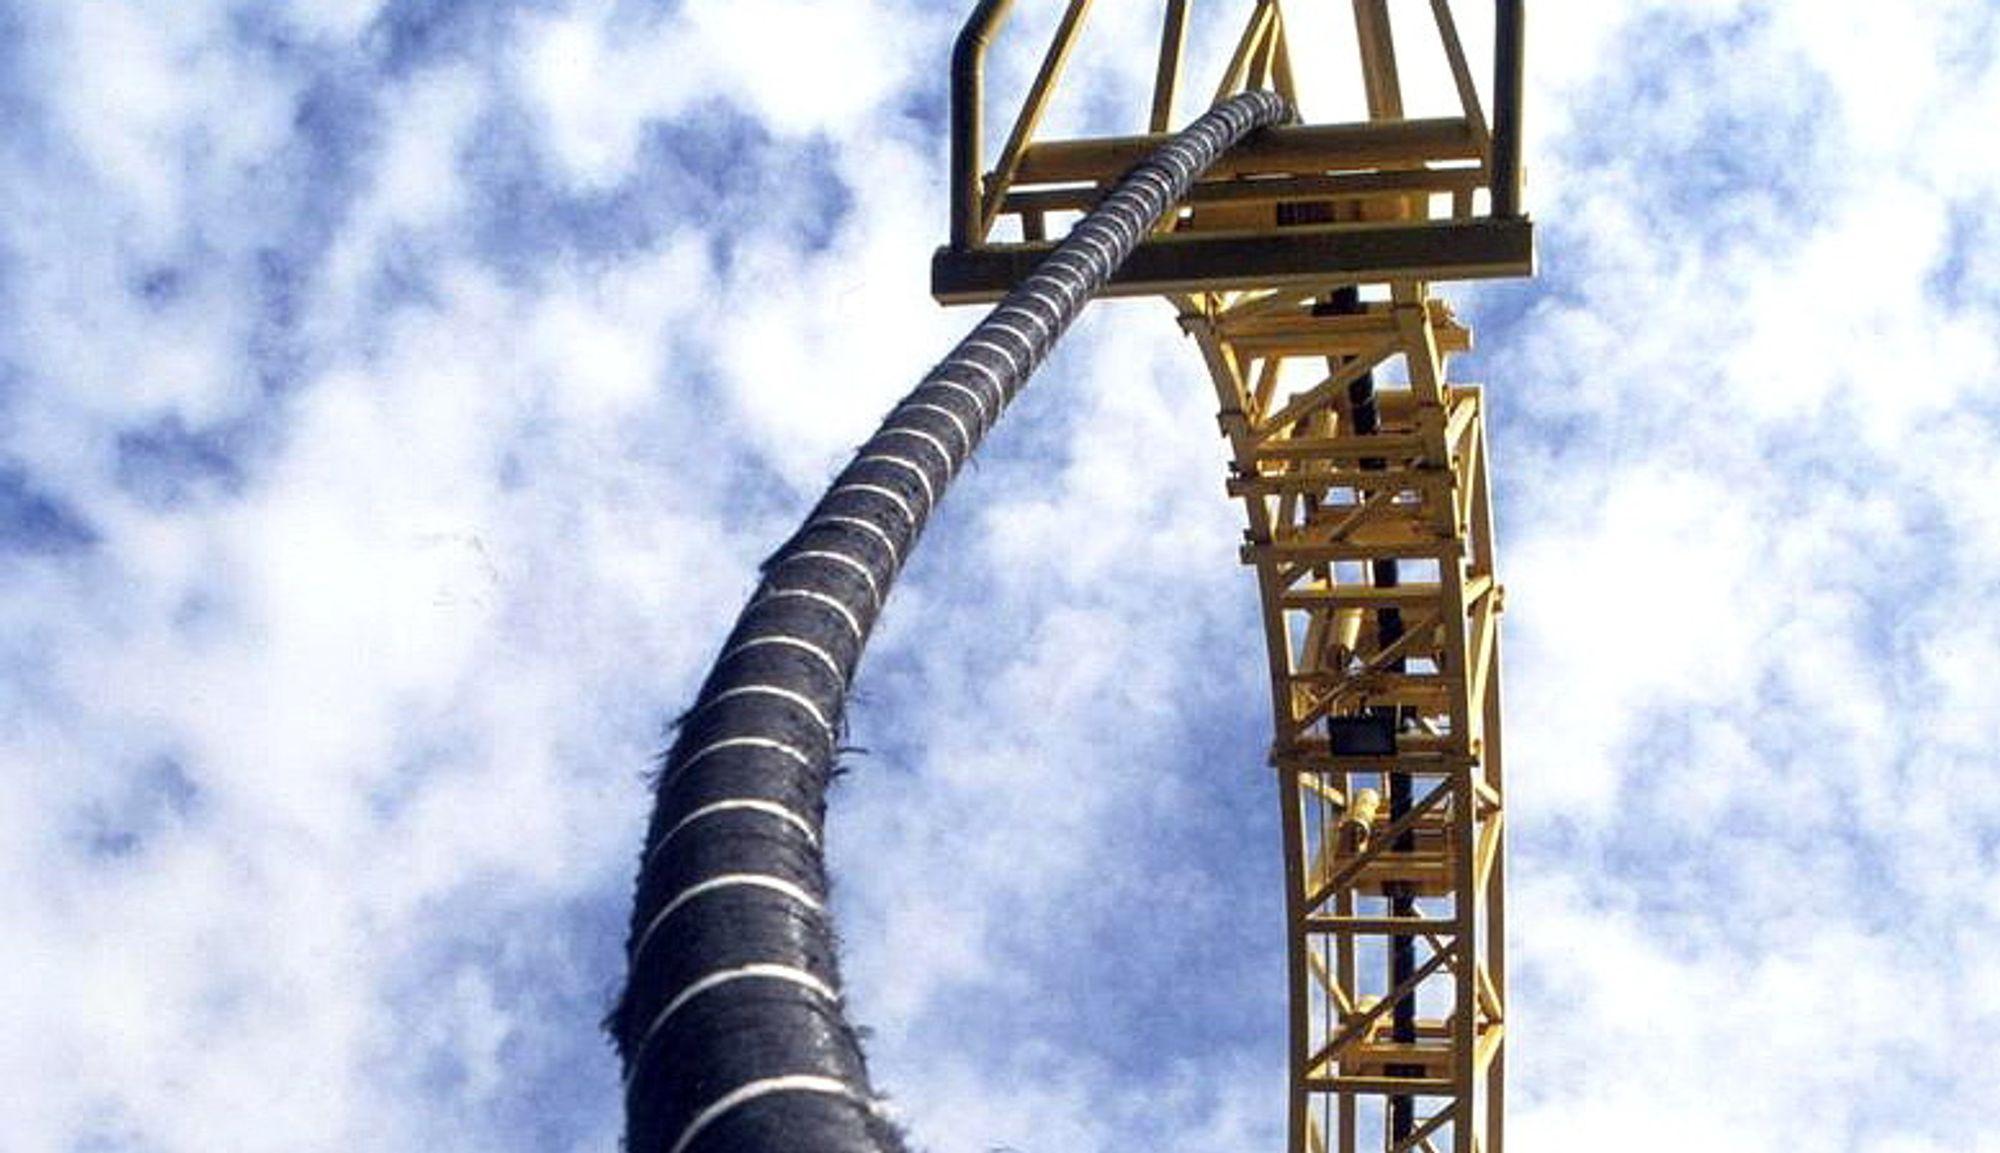 STOR KRAFTEKSPORT: Norge eksporterte hele 5,2 TWh kraft i andre kvartal i år, opplyser NVE.